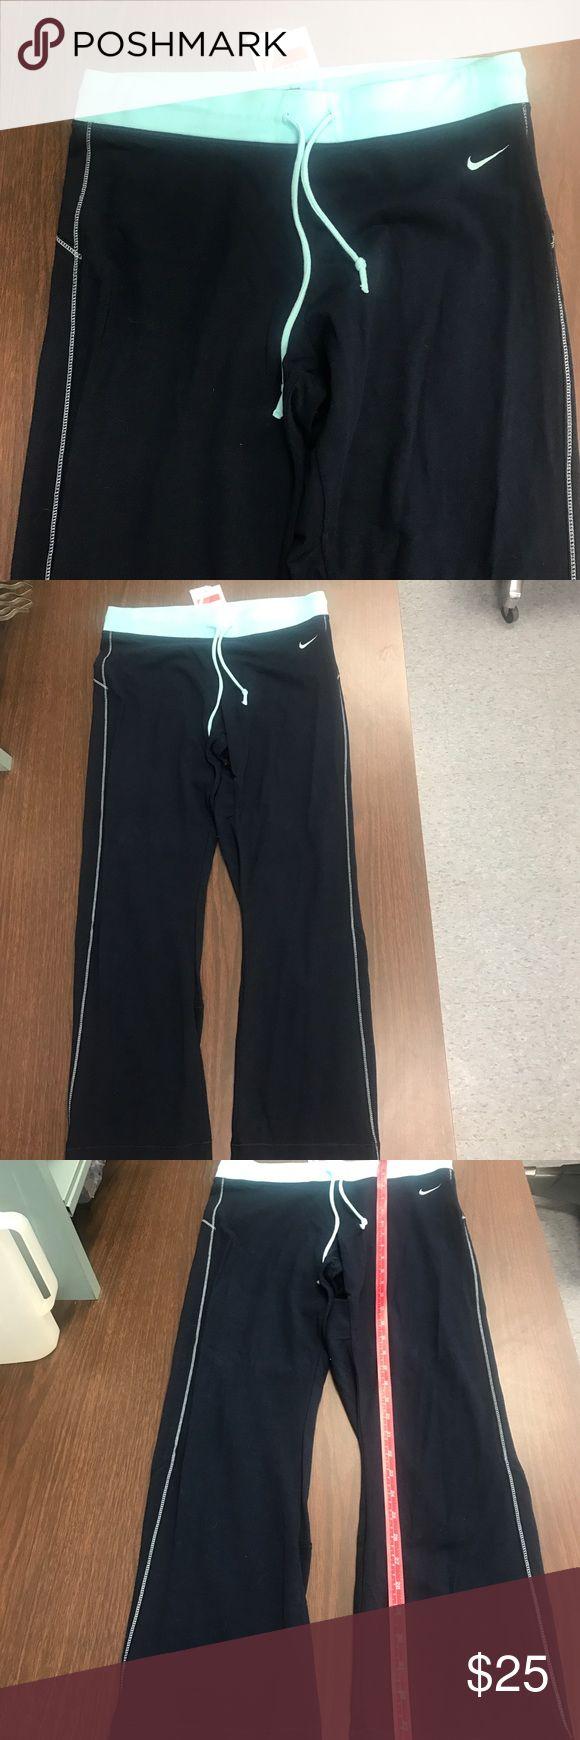 🆕Nike Low rise Training capris 🆕Nike Low rise Training capris. Navy blue with turquoise drawstring/elastic waistband. Size large Nike Pants Capris